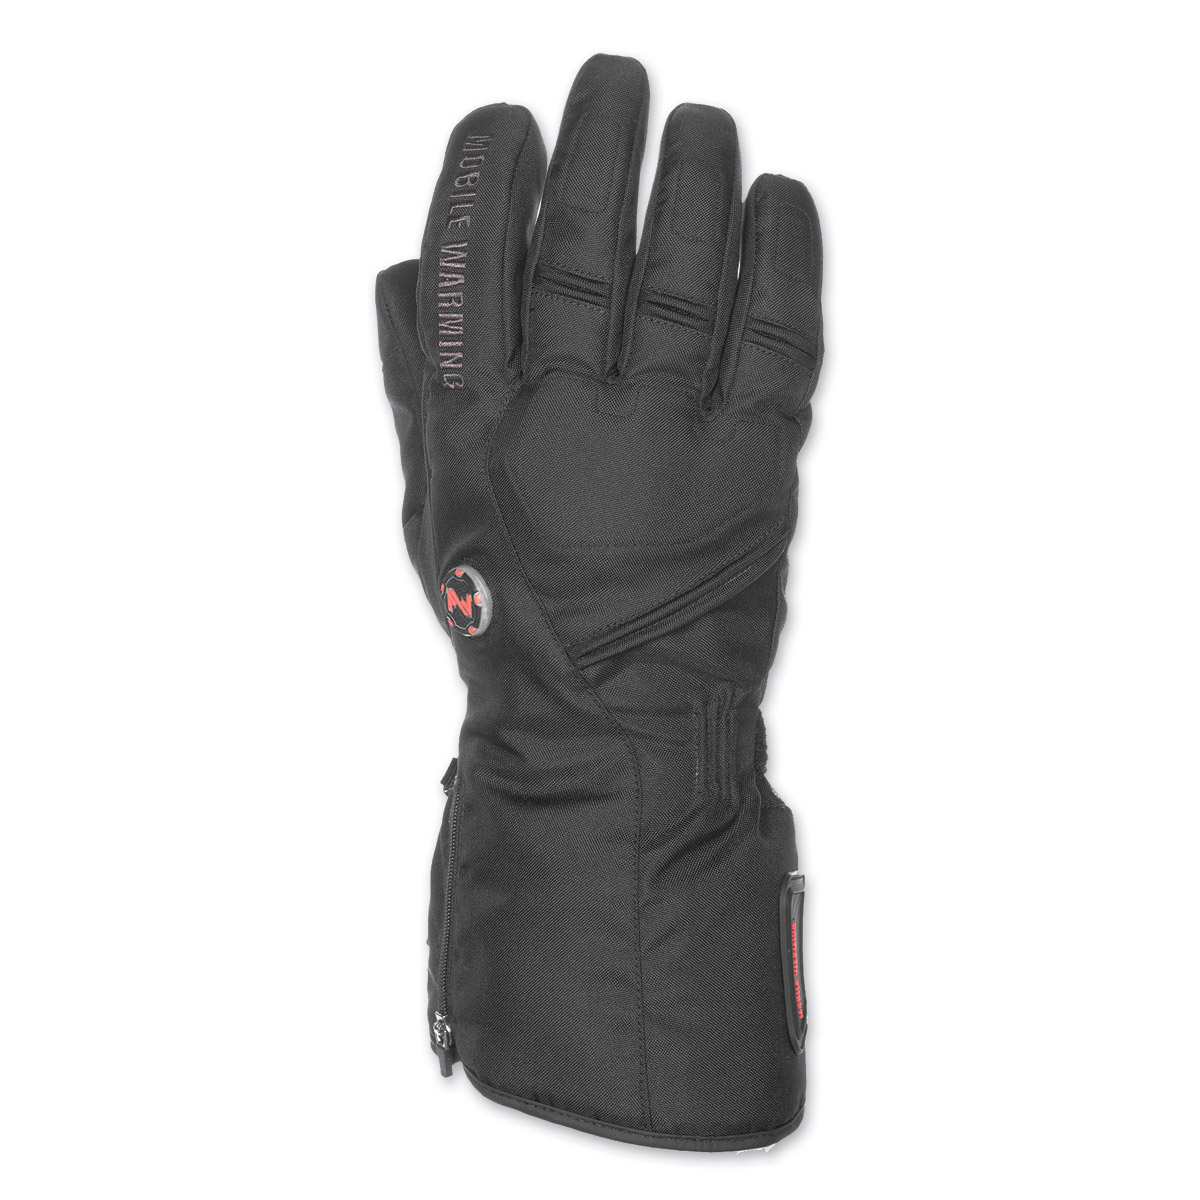 Mobile Warming Men's Geneva Textile 7.4V Heated Black Gloves